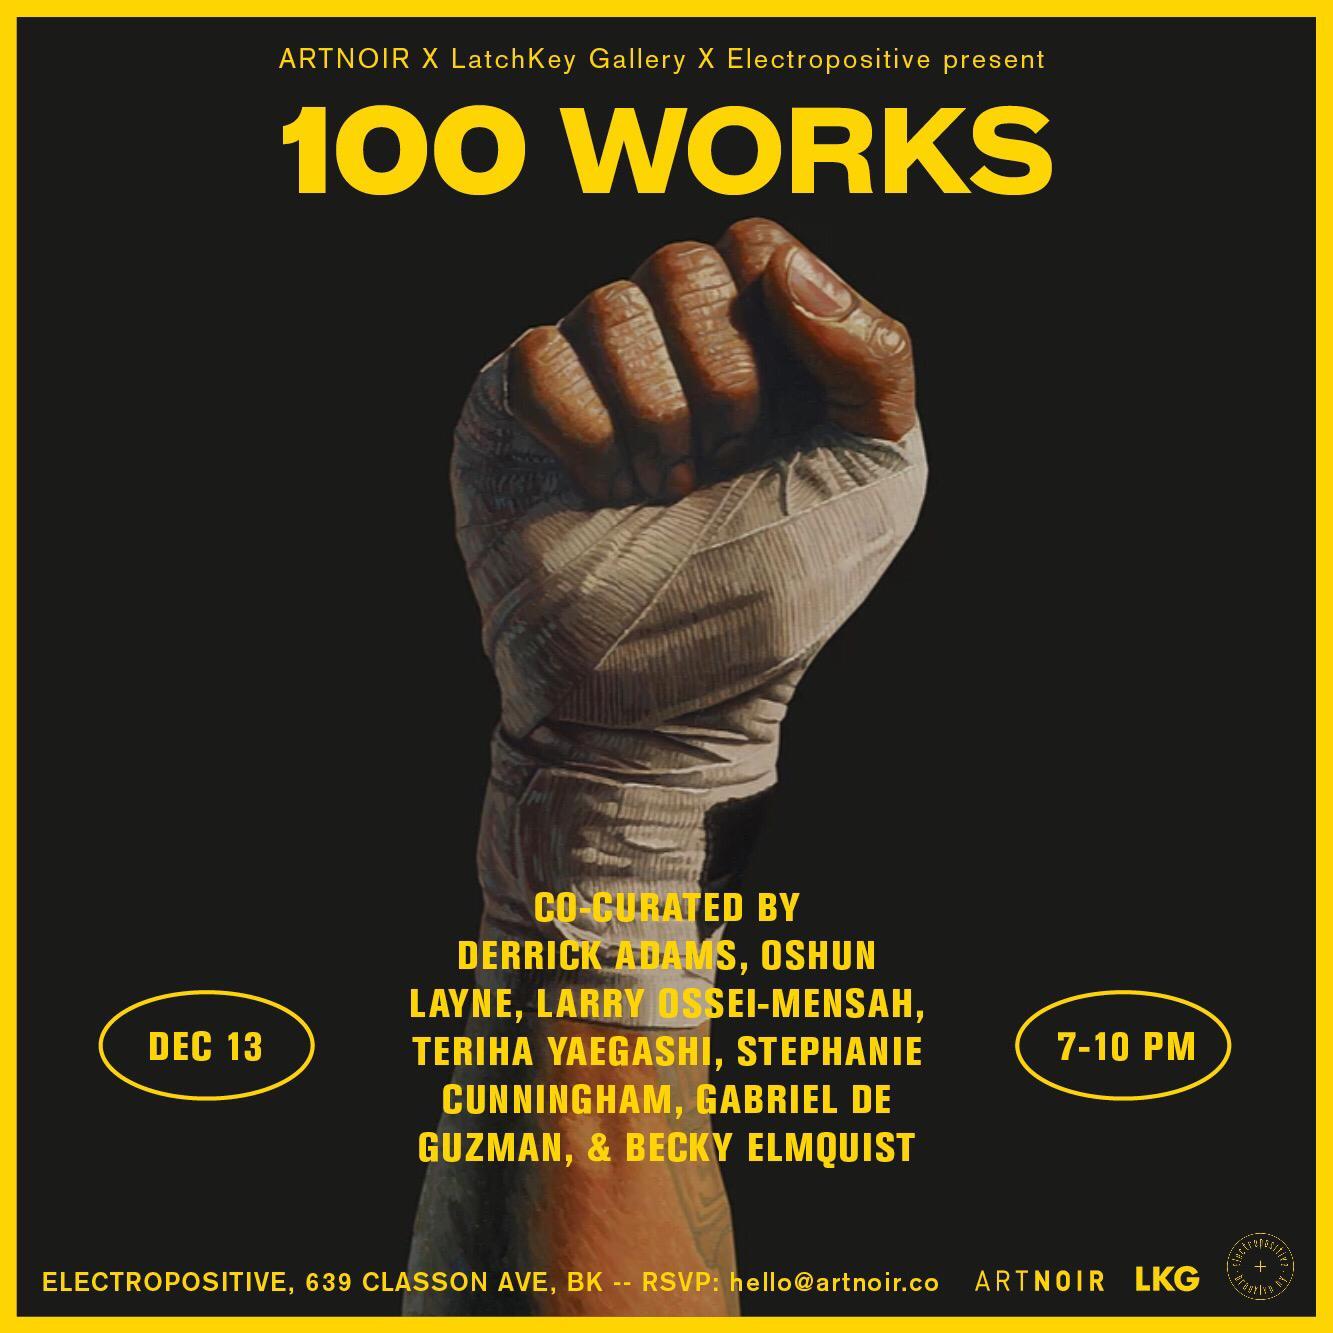 100 works